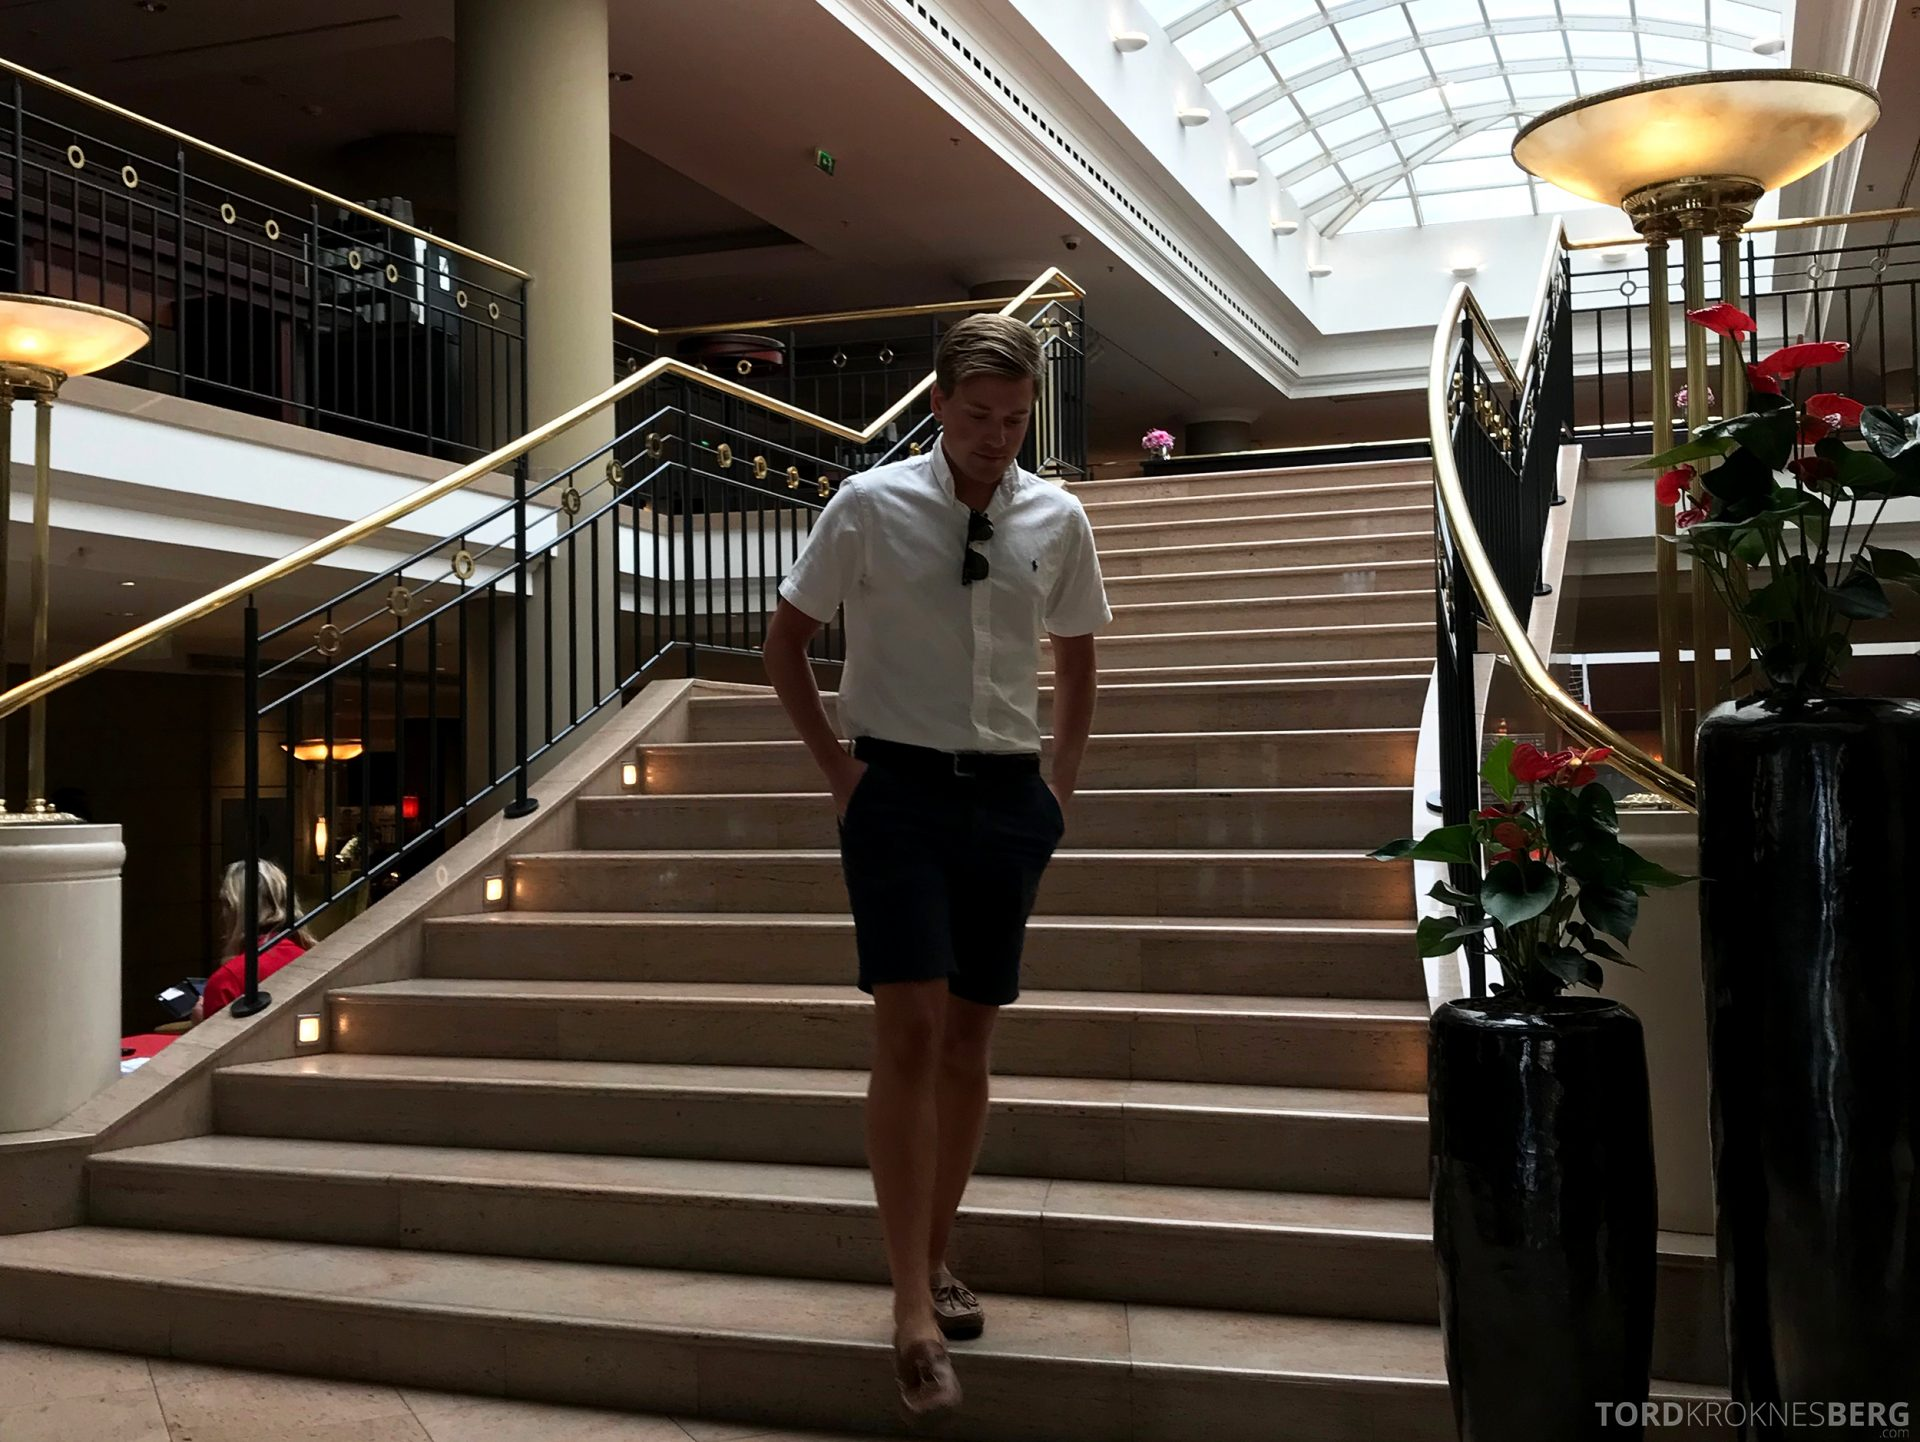 Marriott Prague Hotel Tord Kroknes Berg